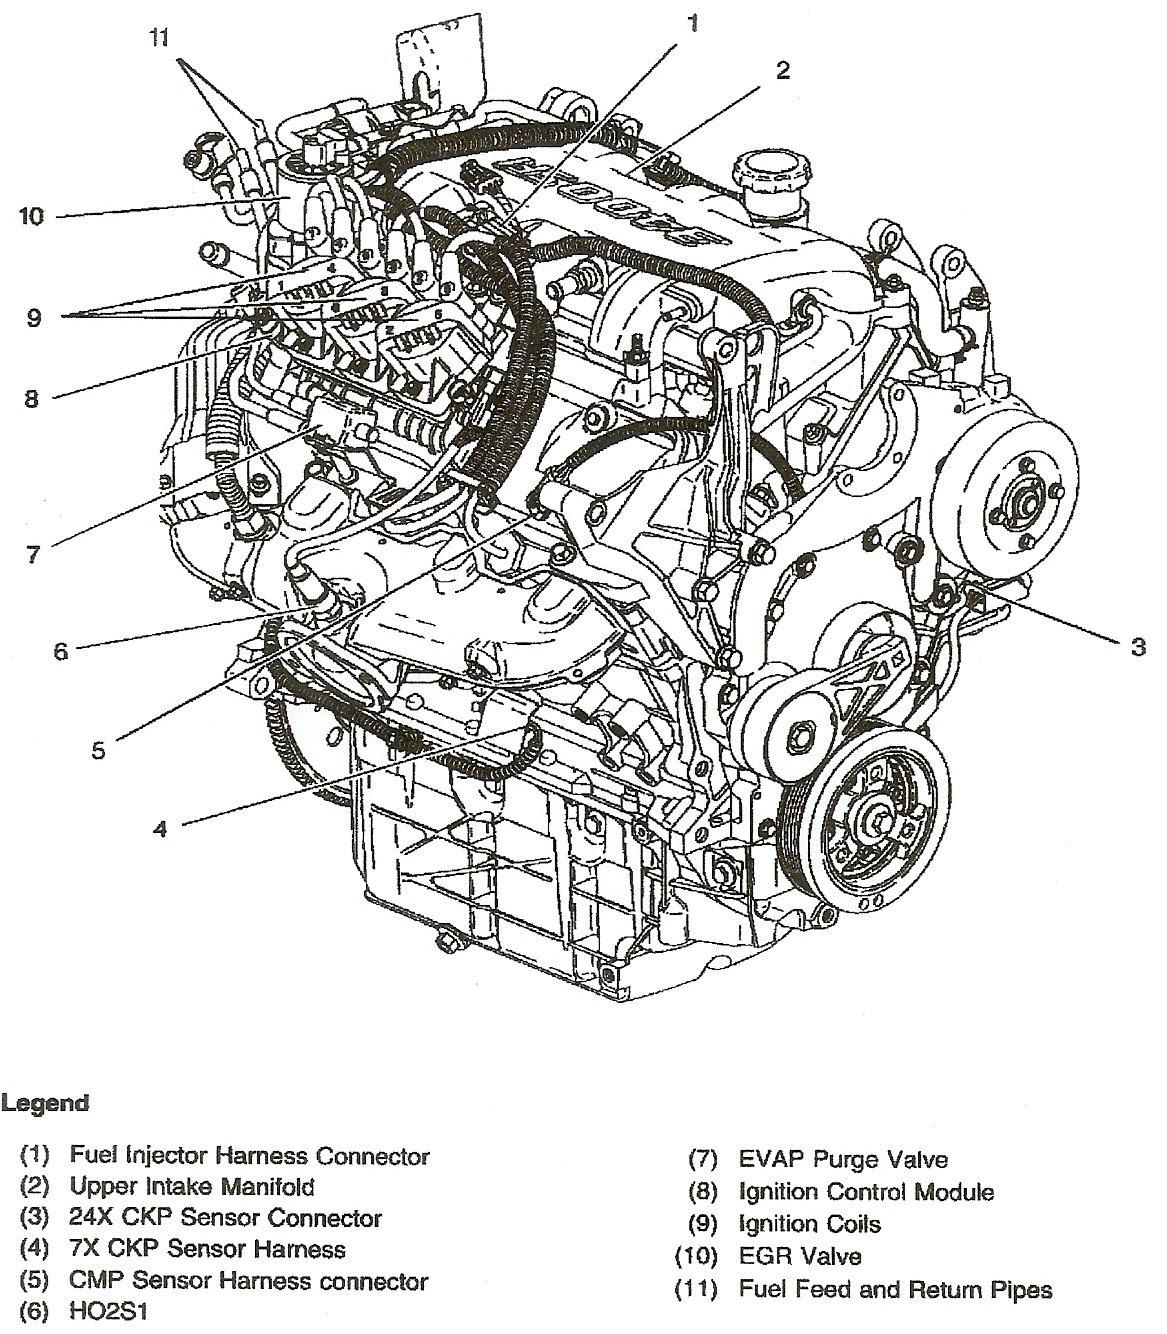 99 Grand Am 2 4 Engine Diagram 1991 Mazda Miata Wiring Diagram Djisamsu Nahmasuk Madfish It